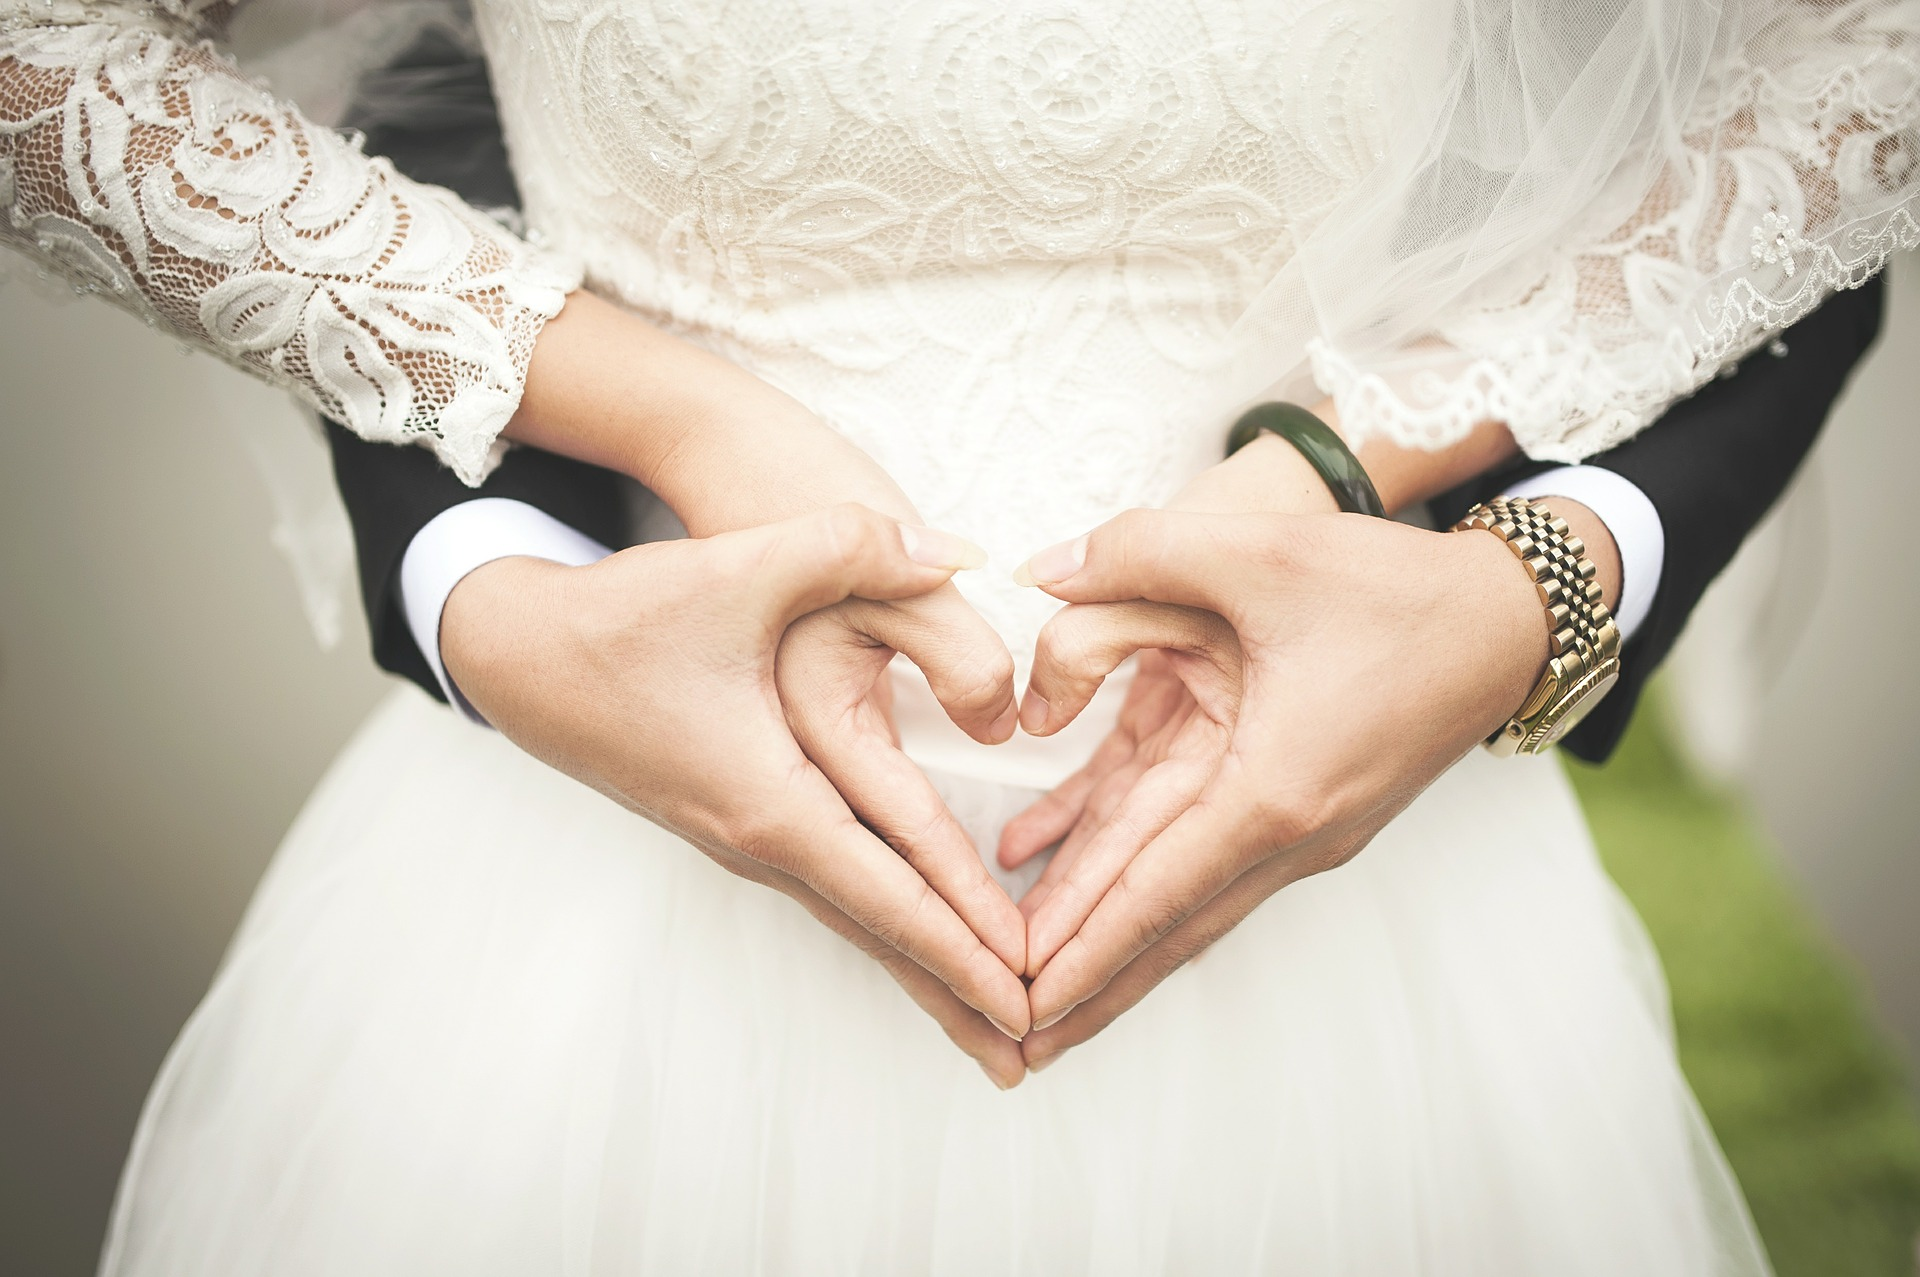 4 Ideas To Capture Wedding Day Memories